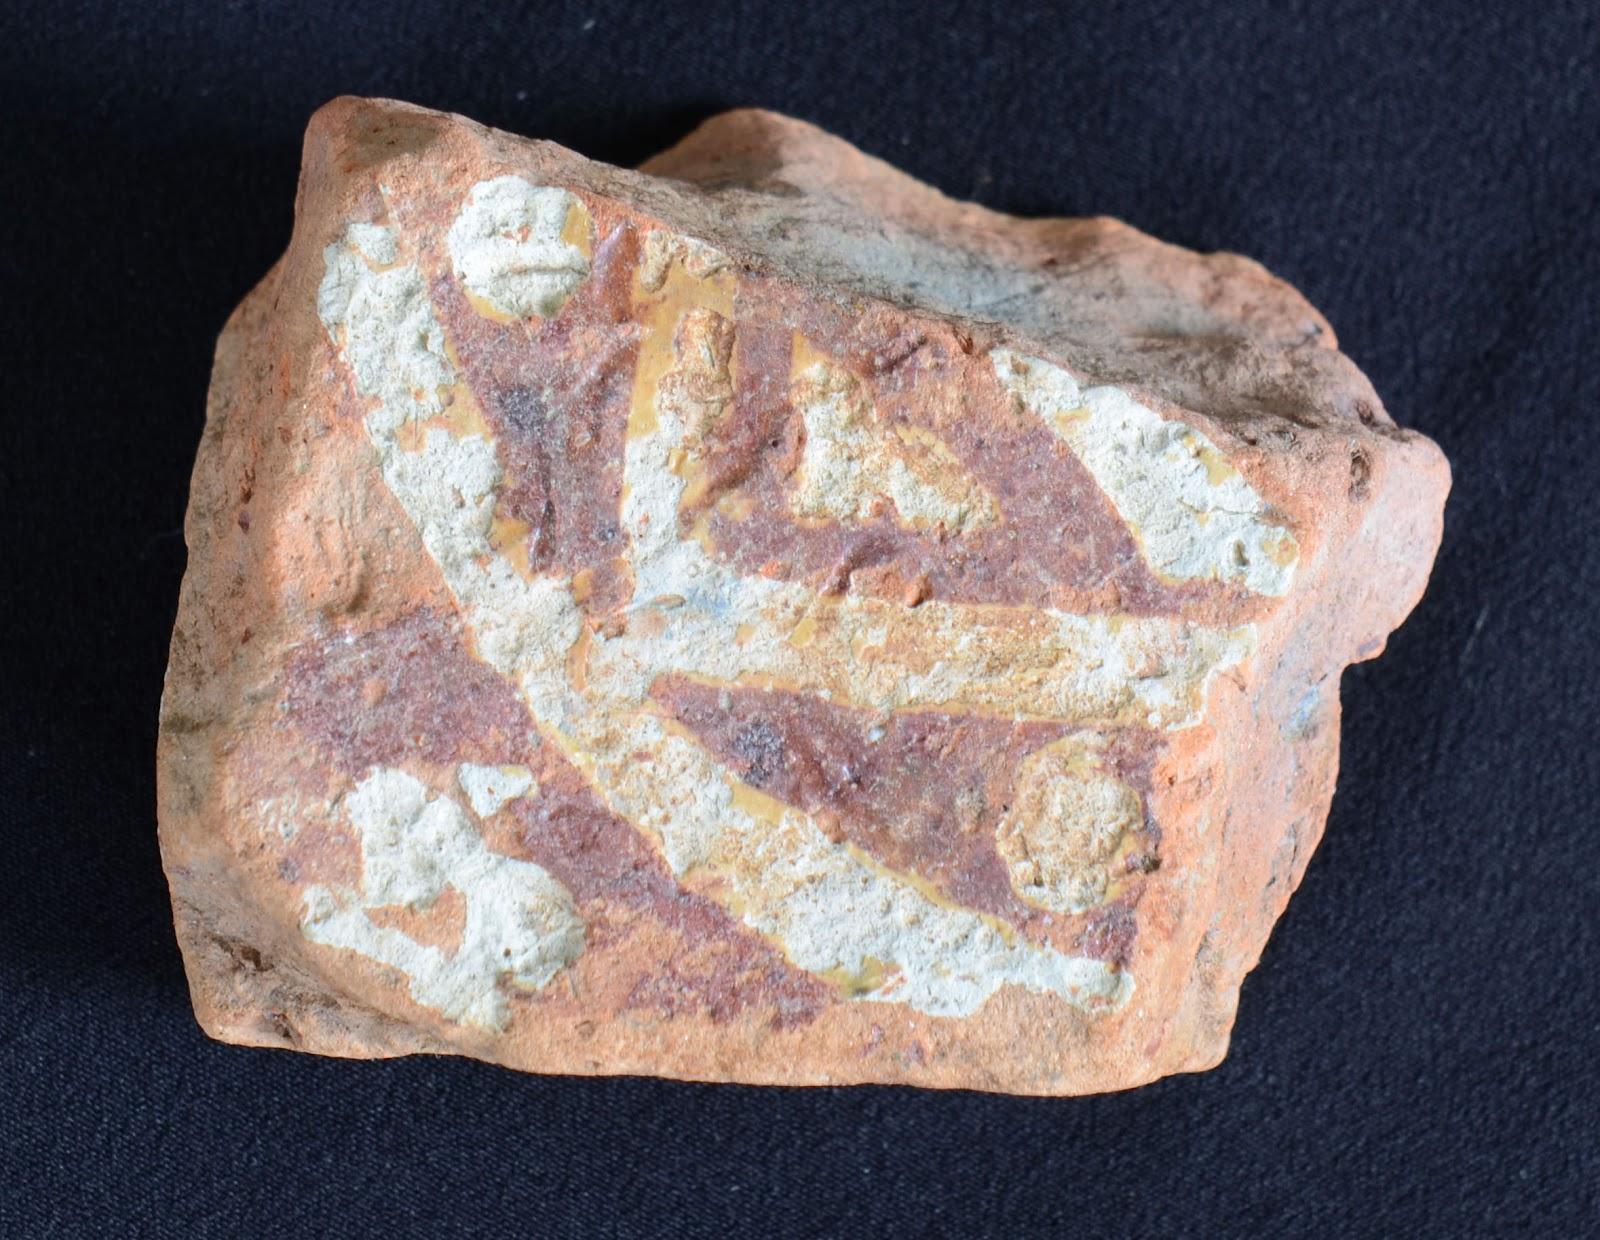 Mudlarking medieval floor tiles 13 14th century sections of medieval floor tile found mudlarking on the thames shiifo